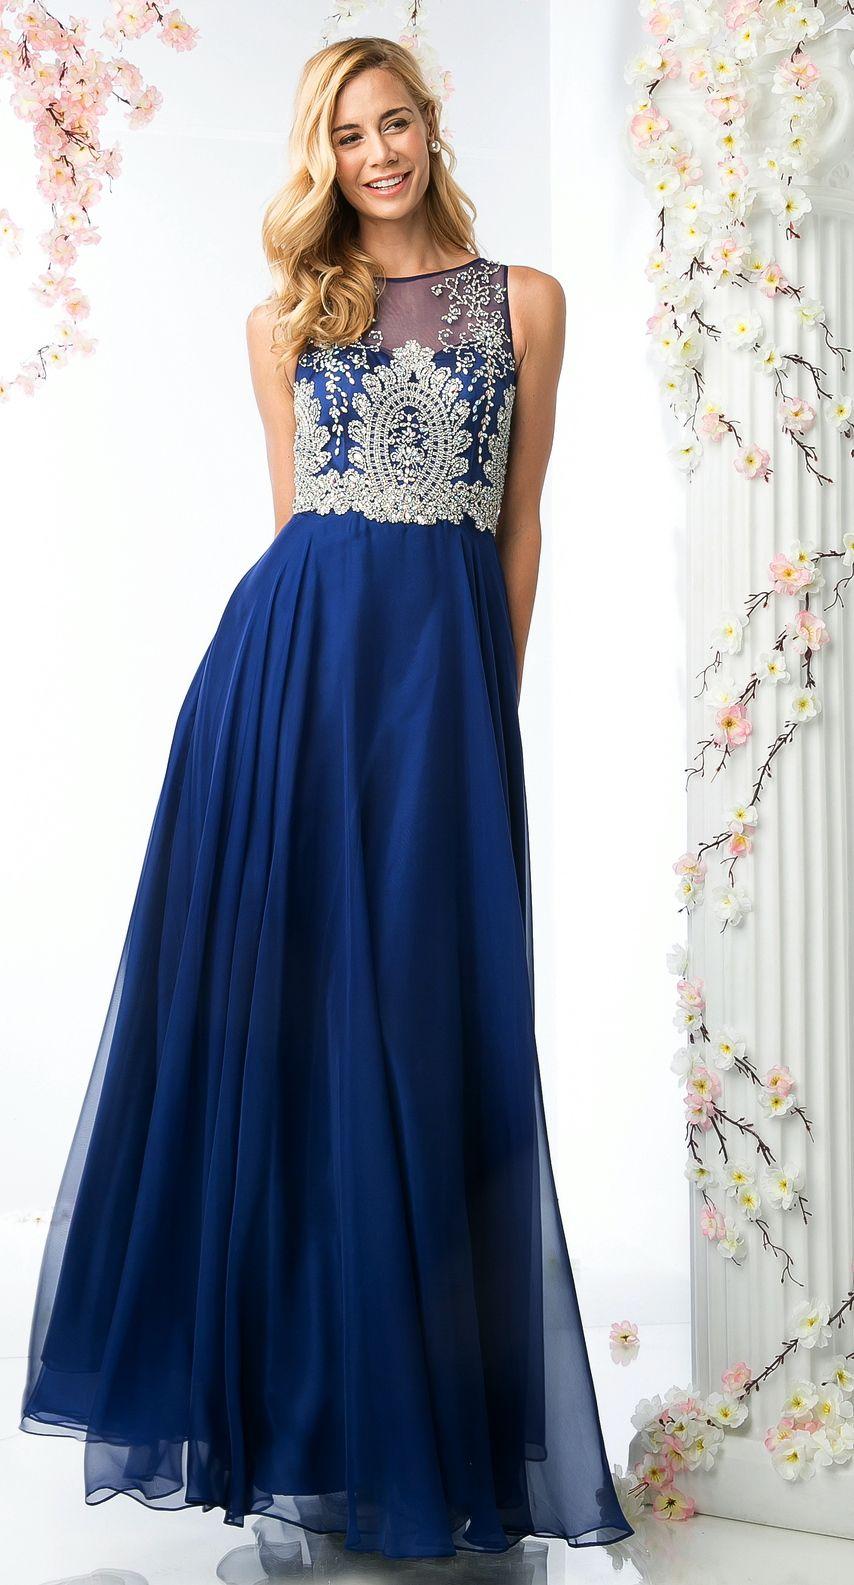 Prom dresses evening dresses by cinderellaucbrueadducbrueembellished